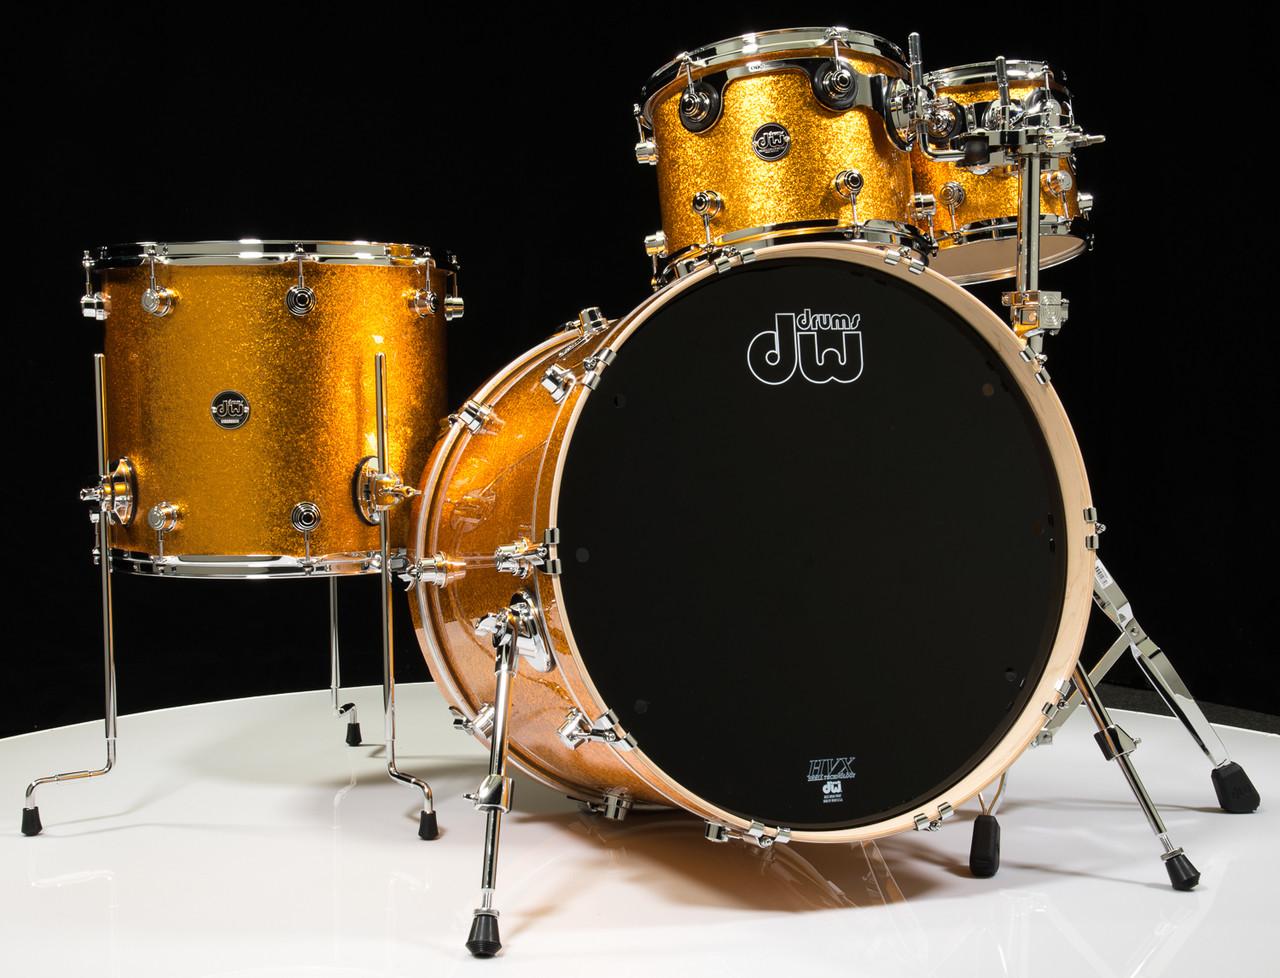 dw performance series 4pc gold sparkle. Black Bedroom Furniture Sets. Home Design Ideas